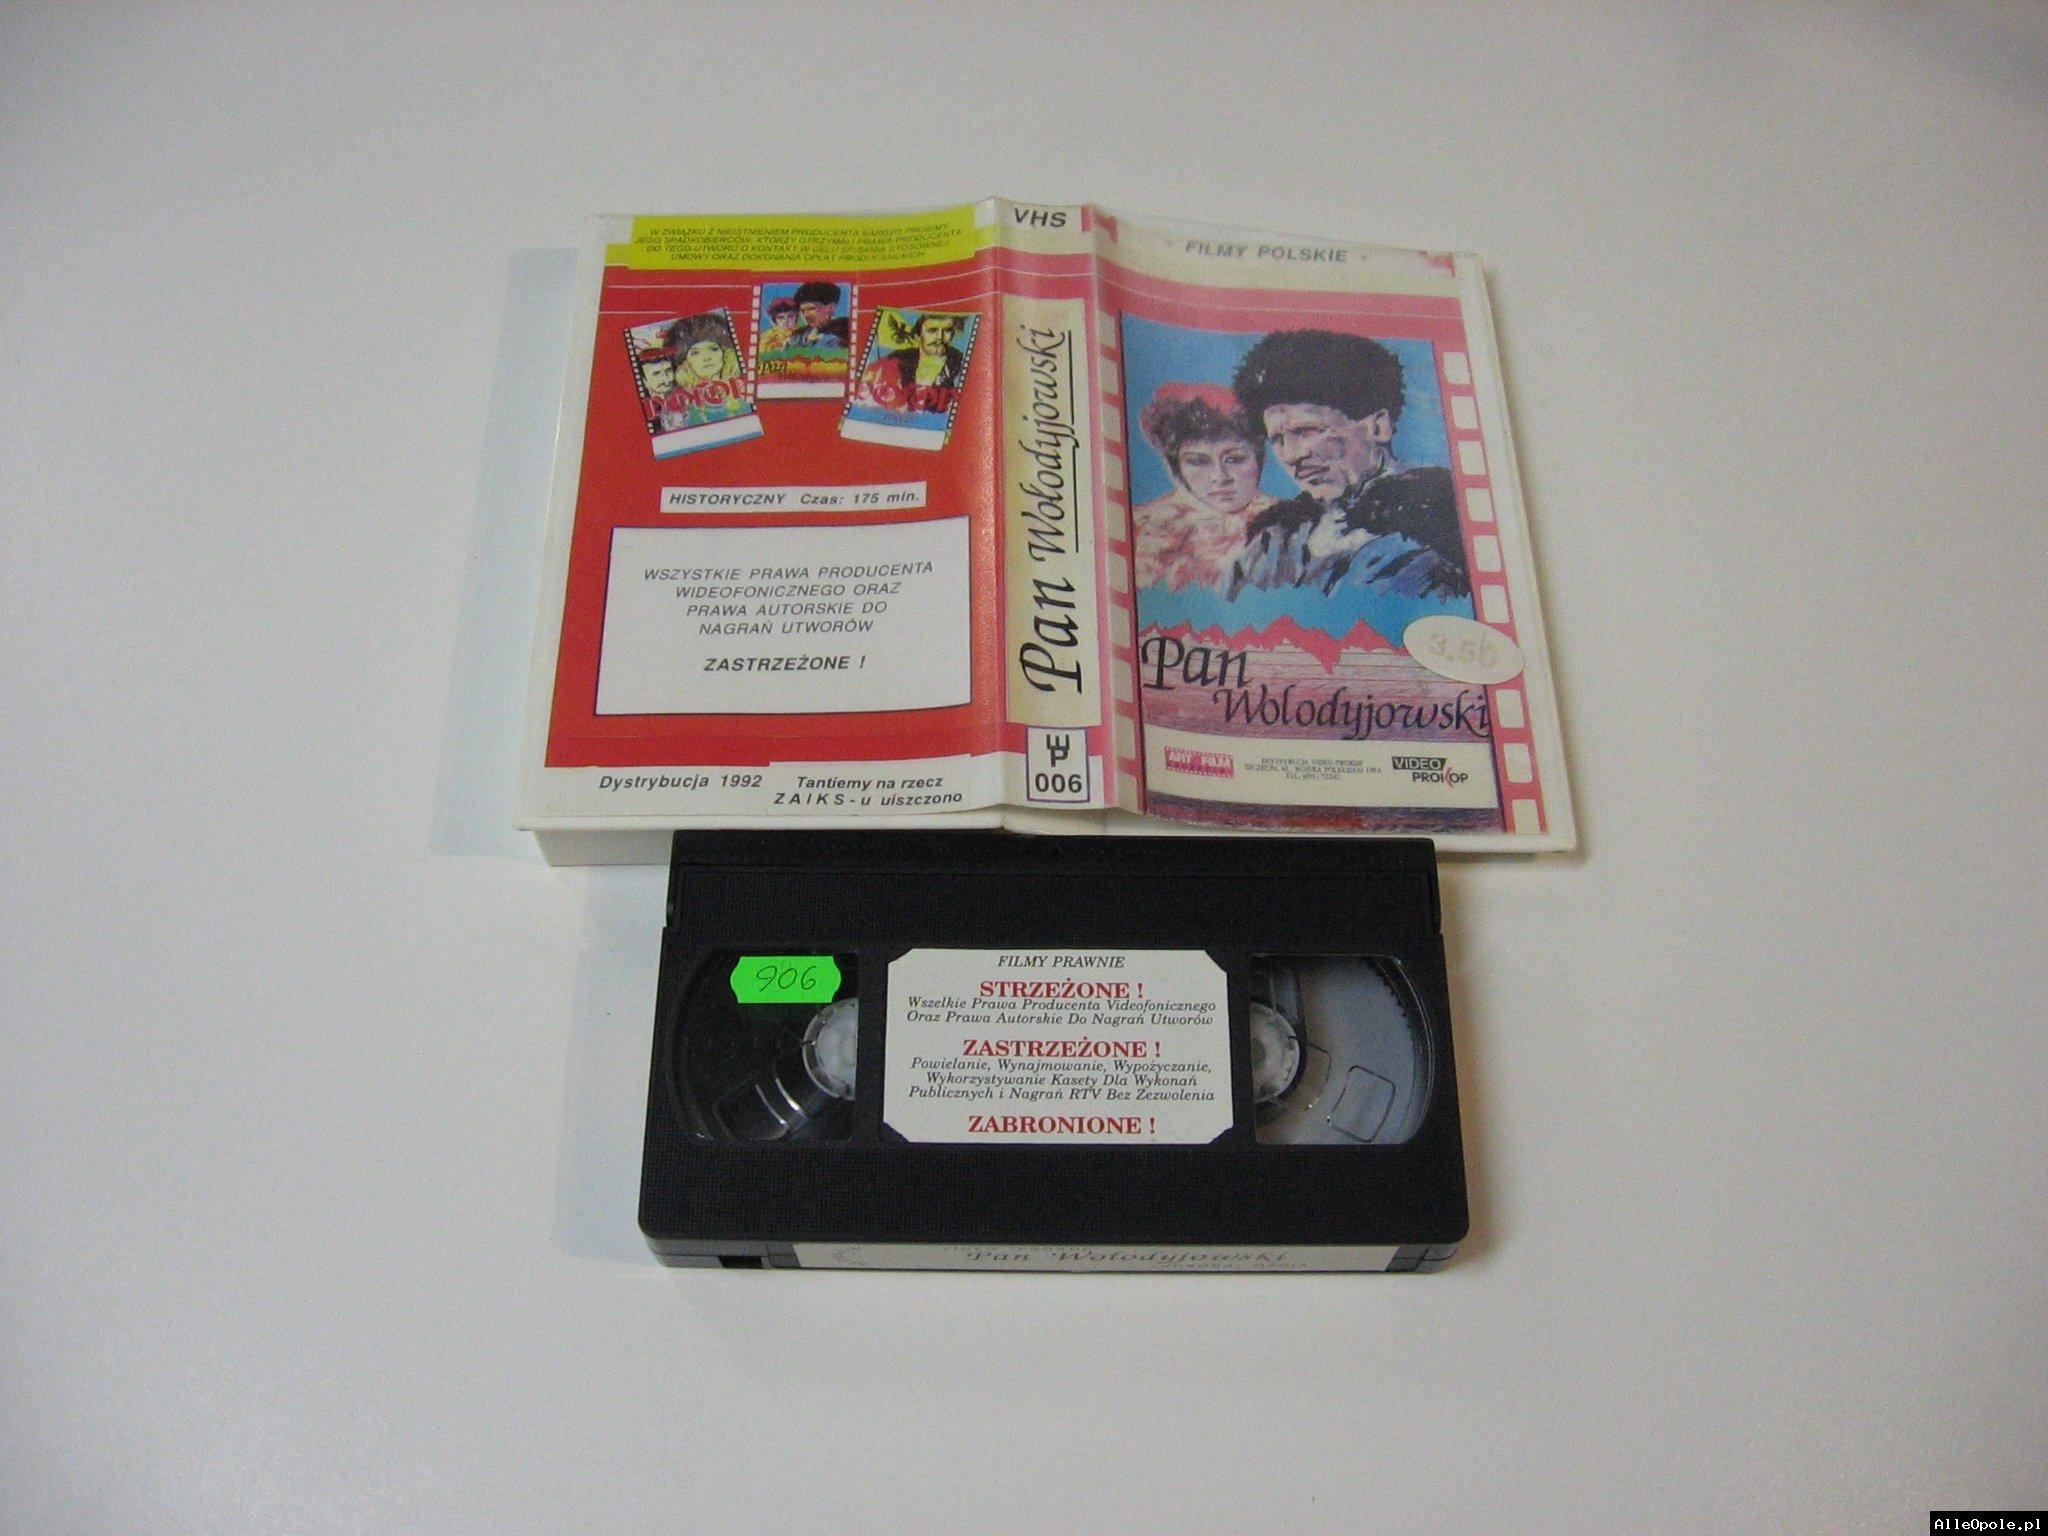 PAN WŁODYJIWSKI - VHS Kaseta Video - Opole 1777